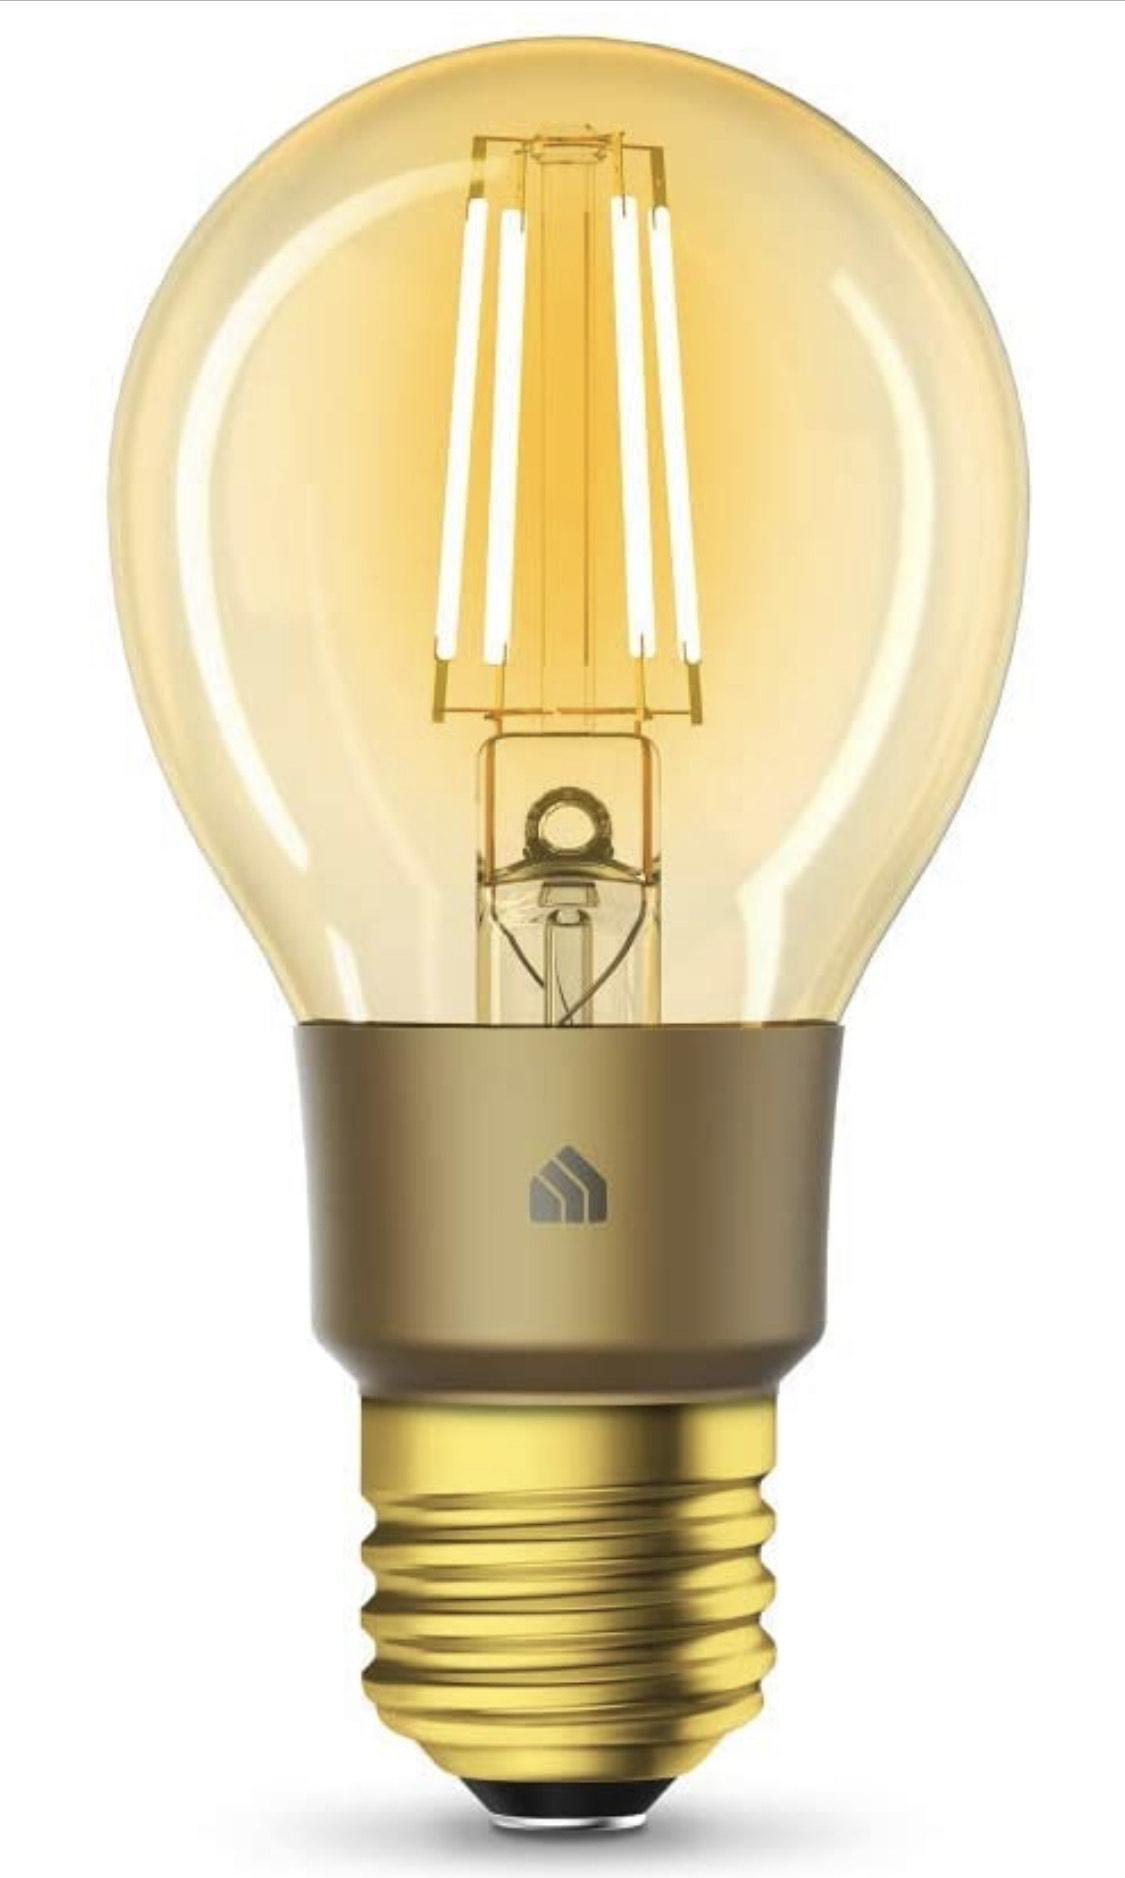 TP-Link KL60 Kasa Smart WLAN Filament Glühbirne